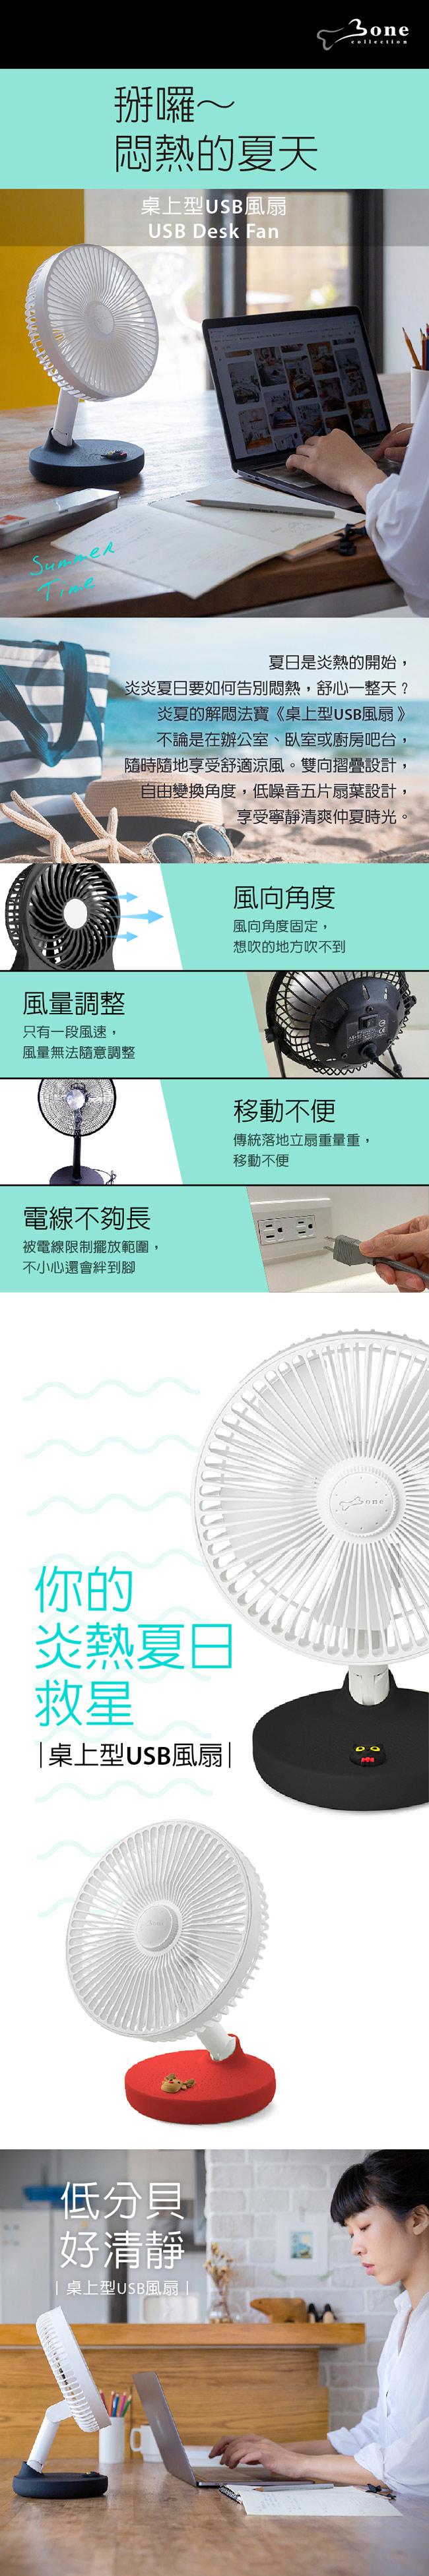 Bone|桌上型USB風扇 / USB Desk Fan - 漫威